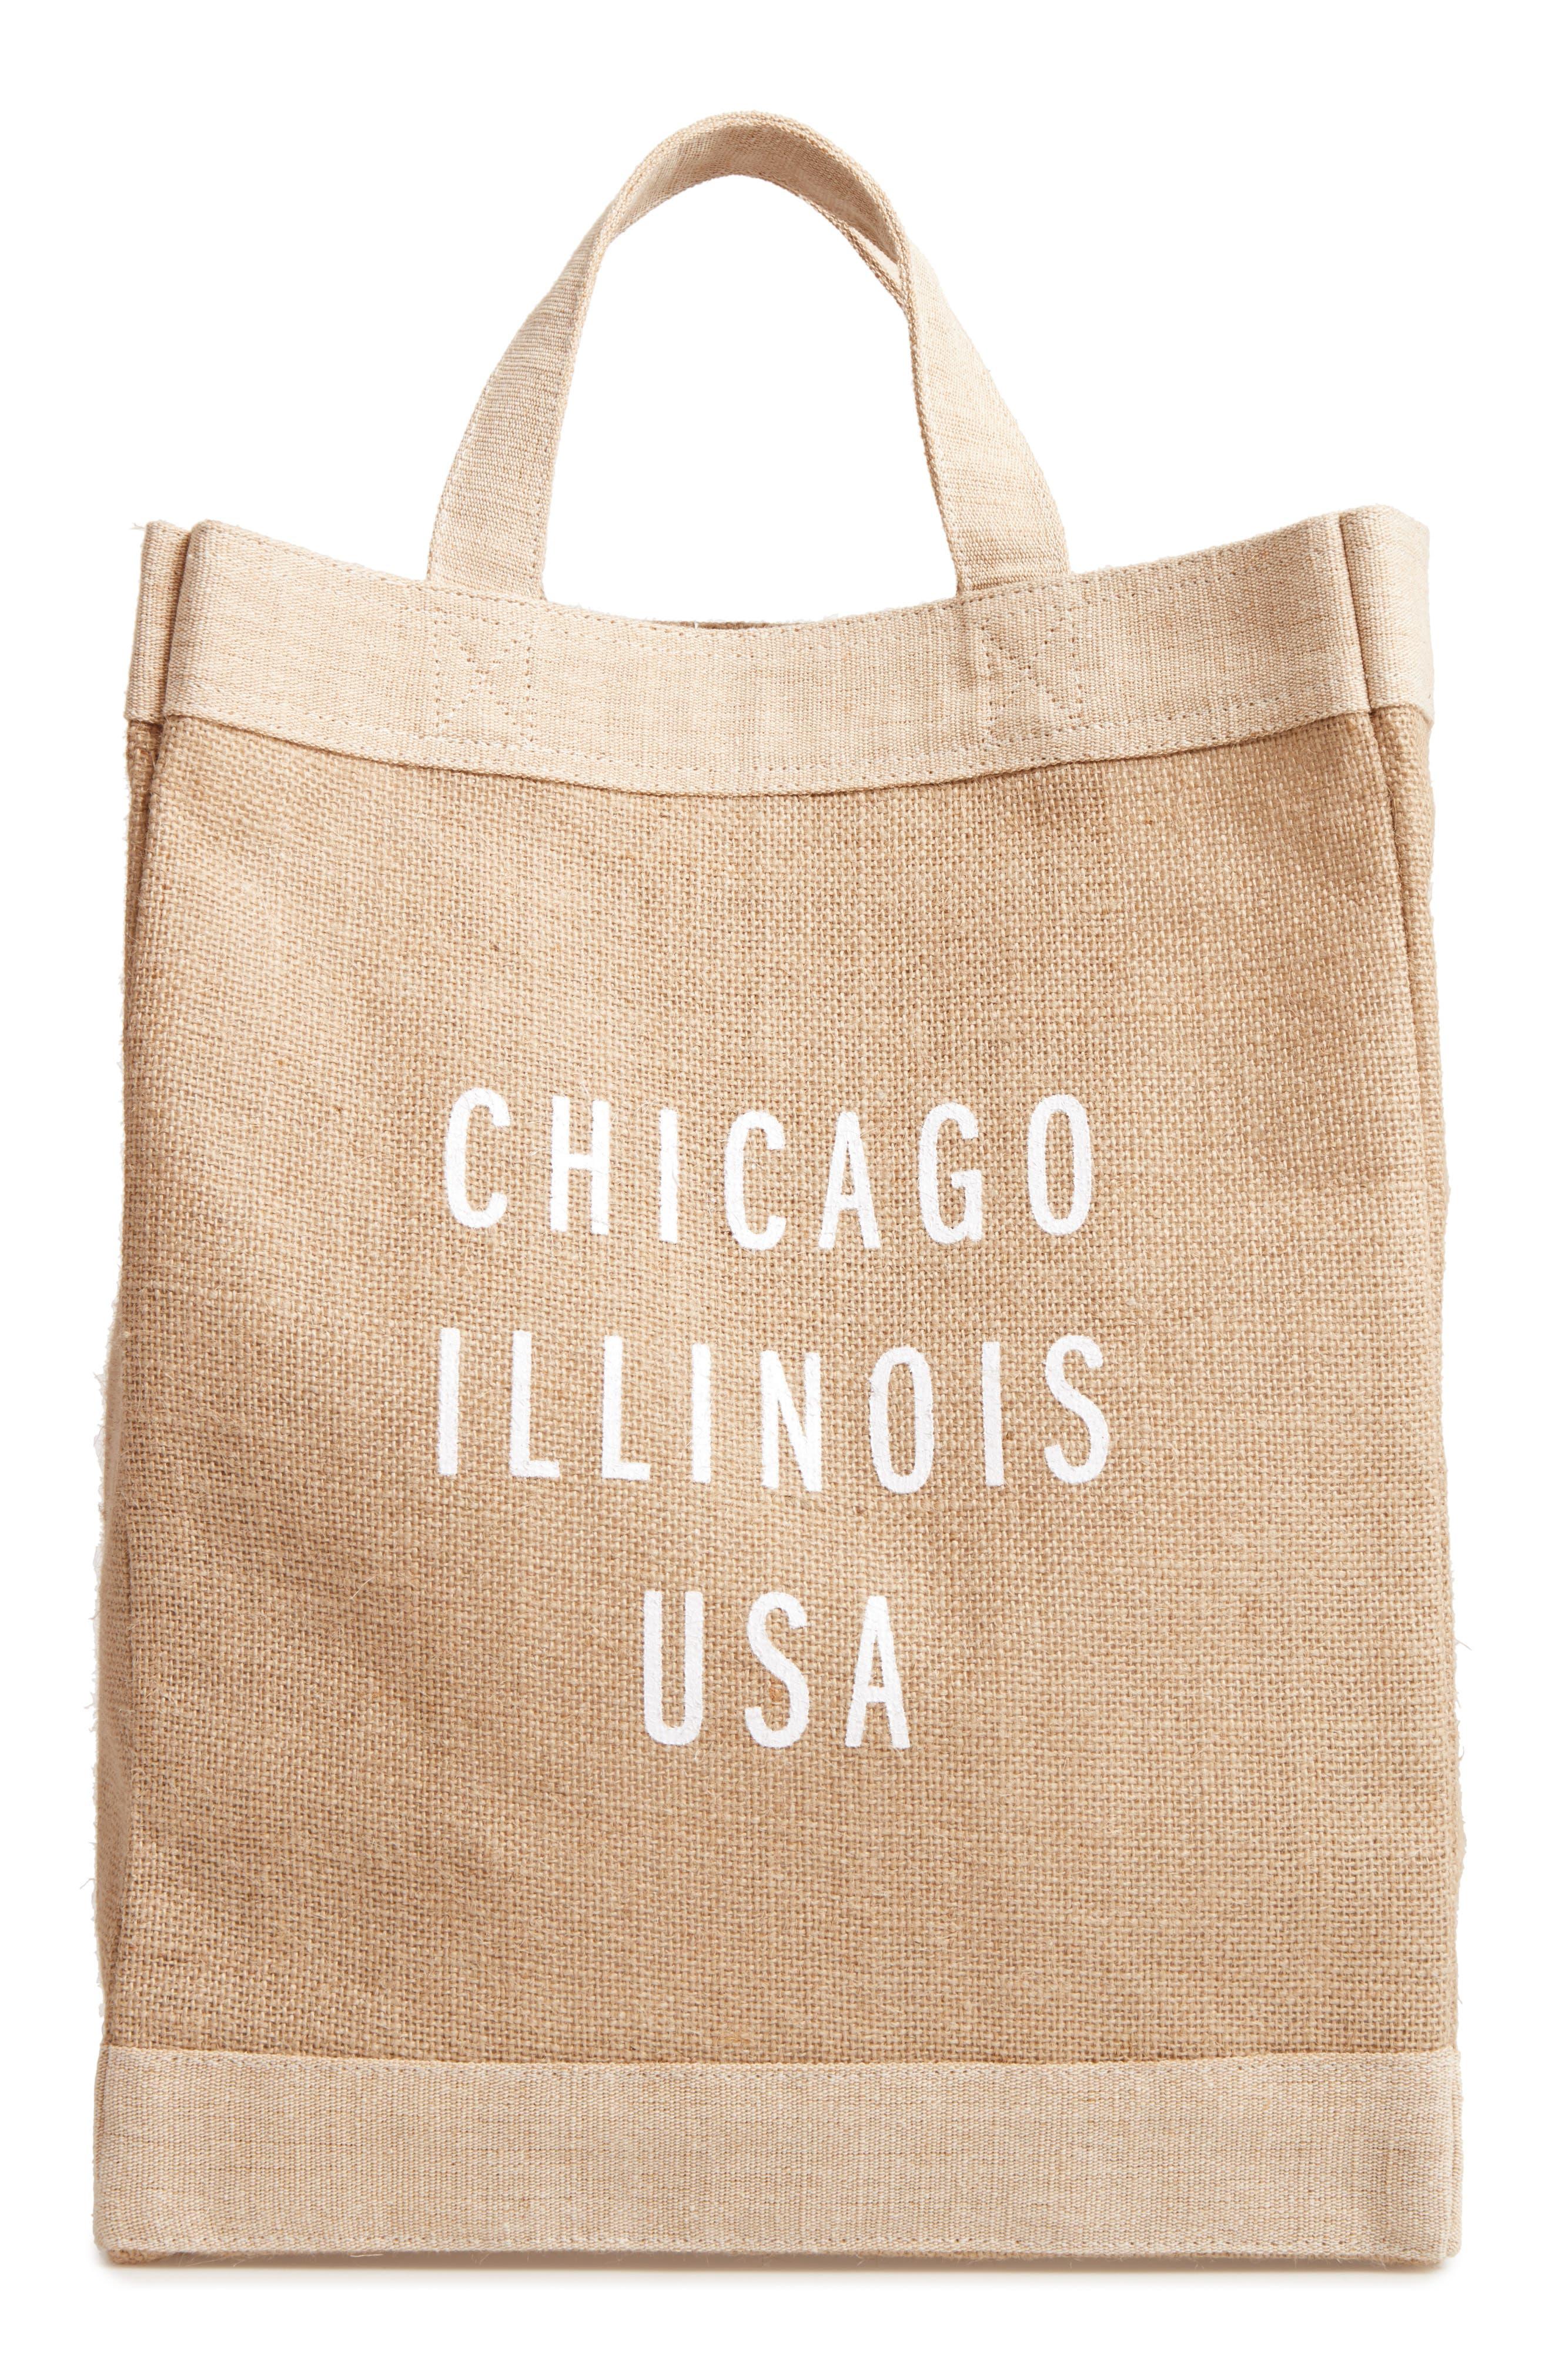 Chicago Simple Market Bag,                             Main thumbnail 1, color,                             200